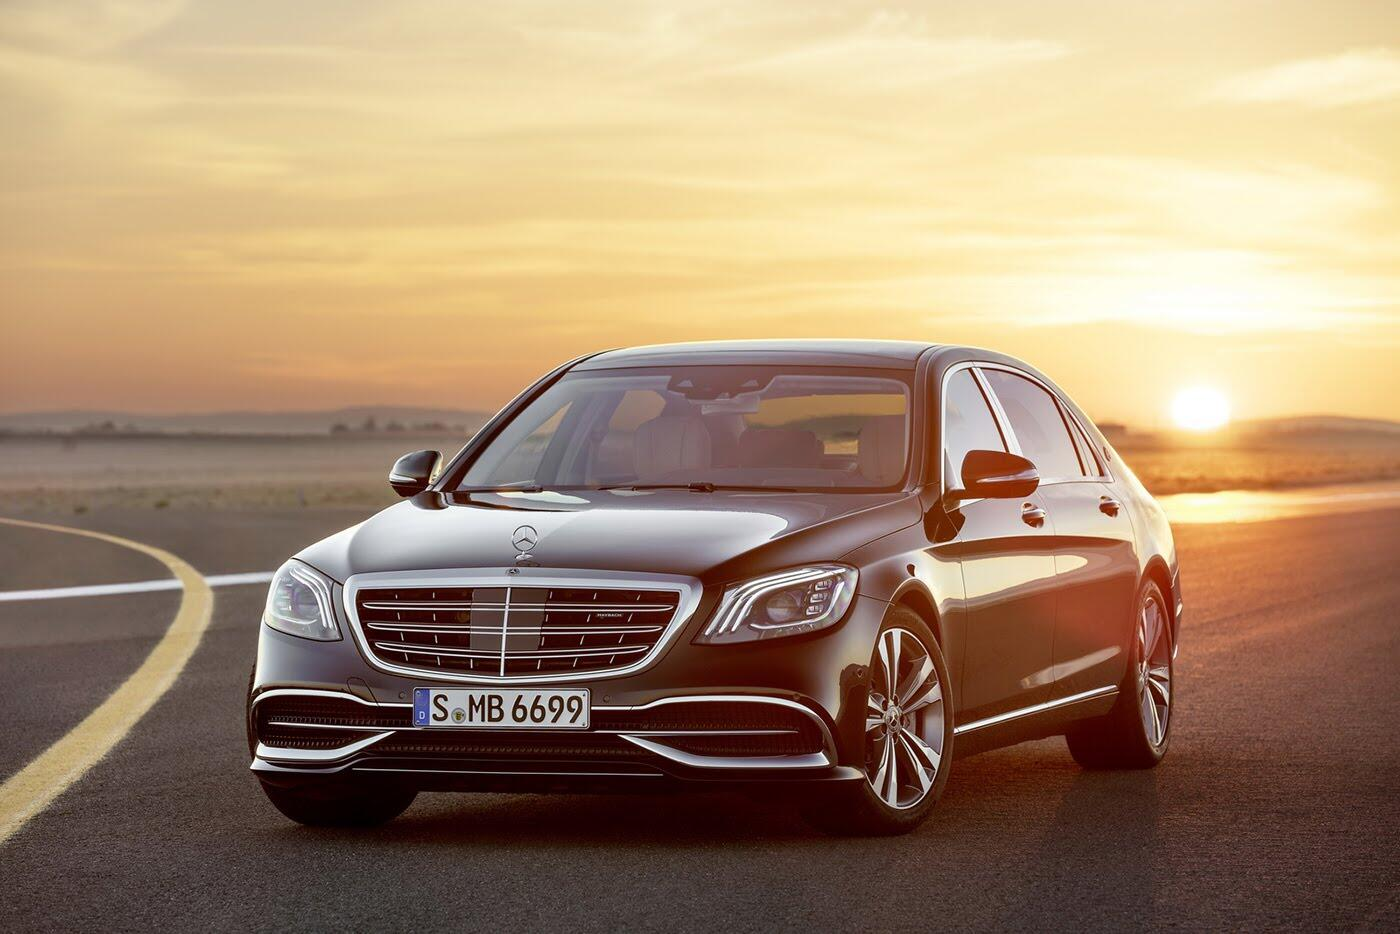 Ảnh chi tiết Mercedes-Benz S-Class 2018 - Hình 6